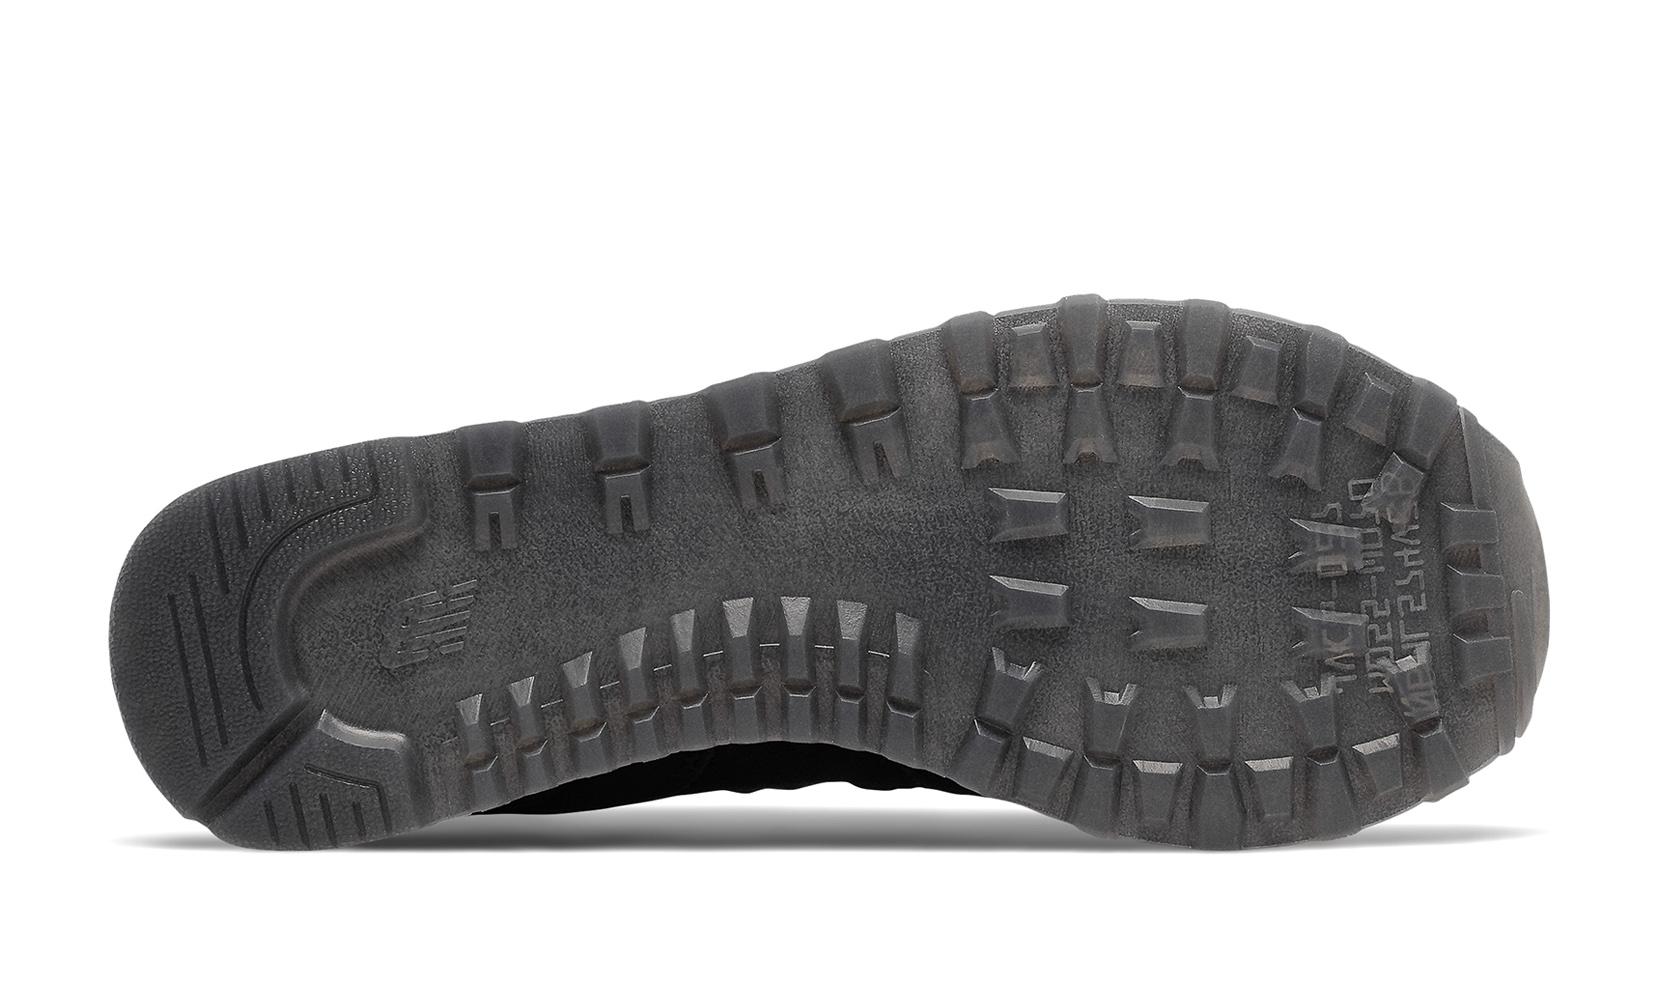 Жіноче взуття повсякденне New Balance 574 Mystic Crystal WL574WNV | New Balance